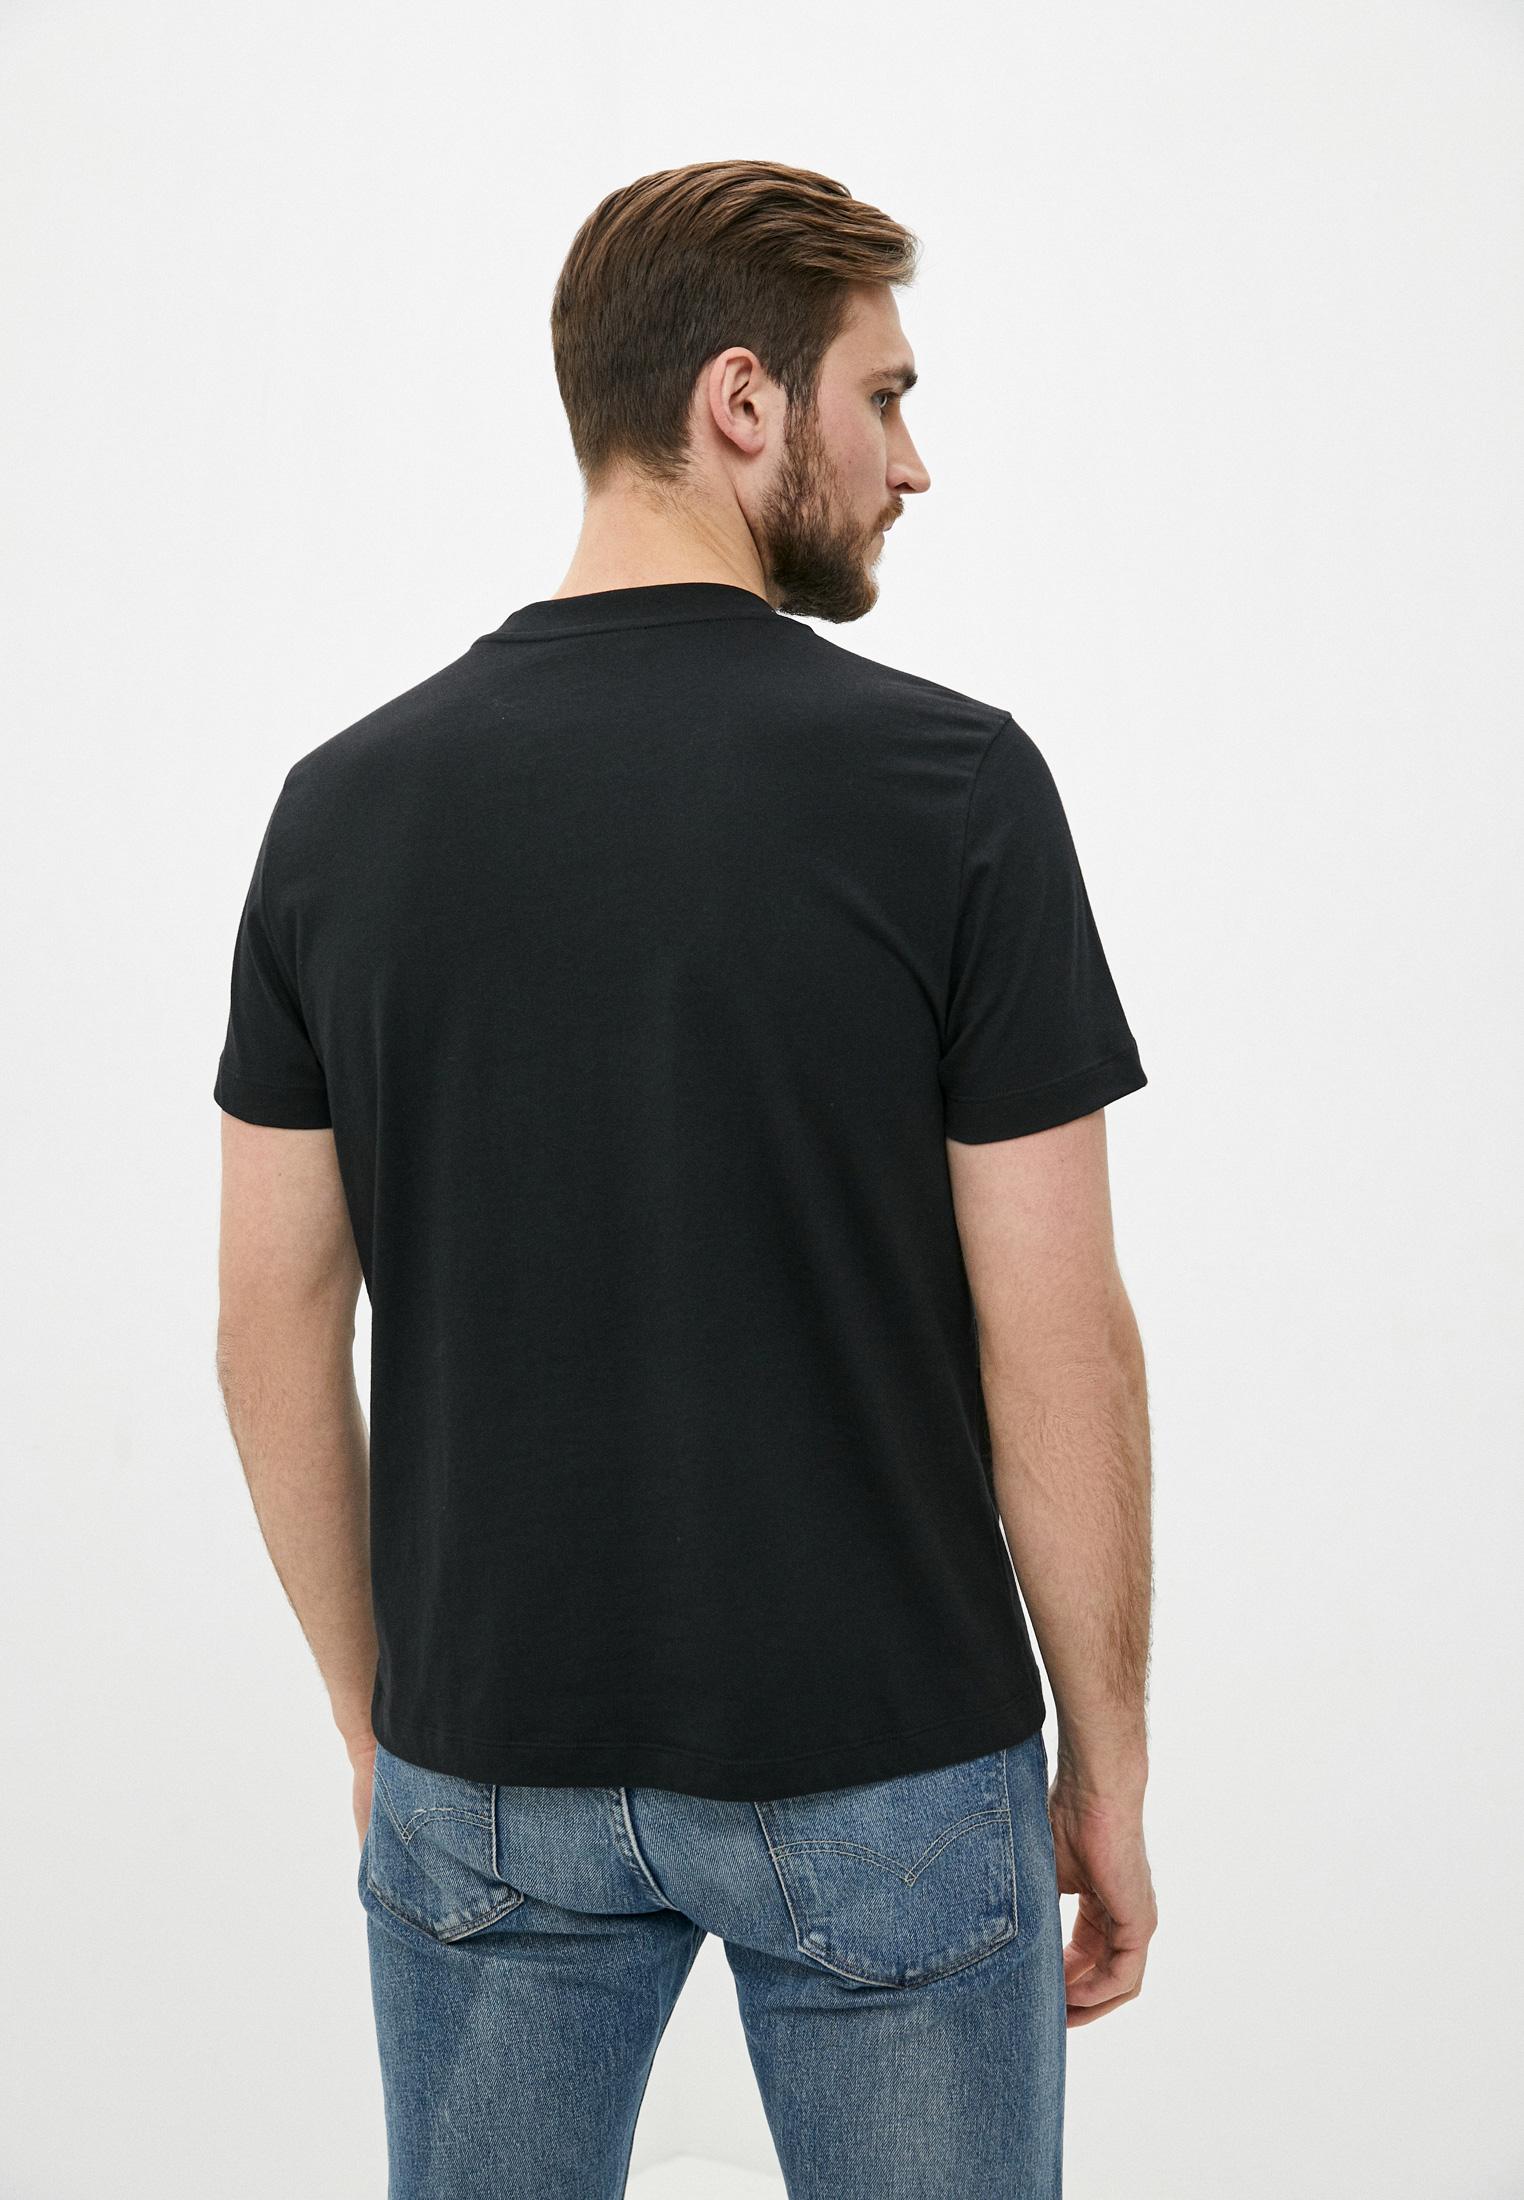 Мужская футболка Trussardi (Труссарди) 52T00443-1T005227: изображение 4